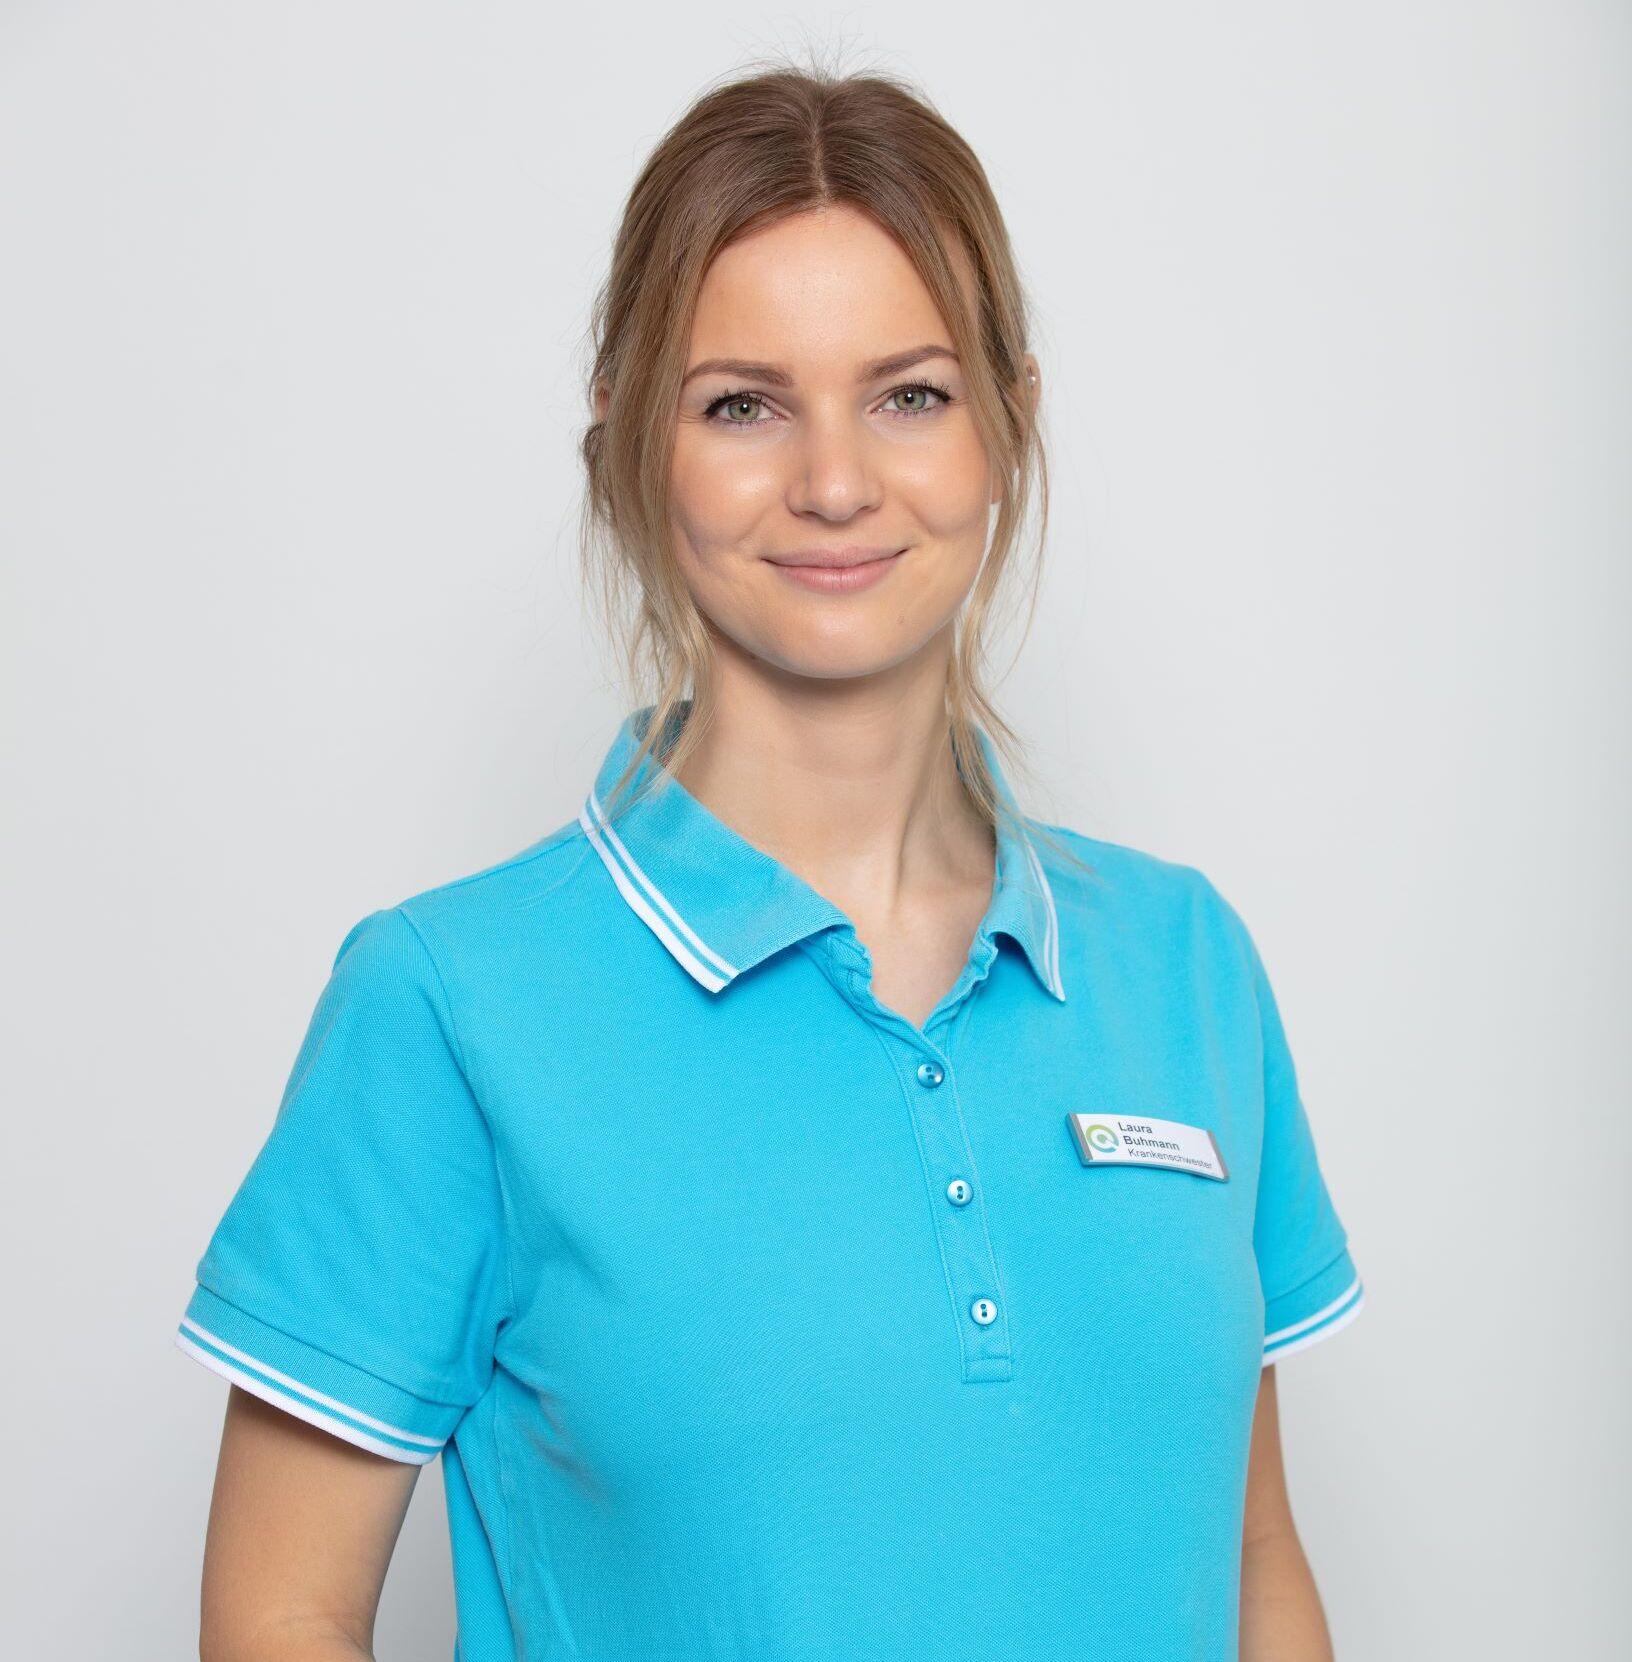 Laura Buhmann